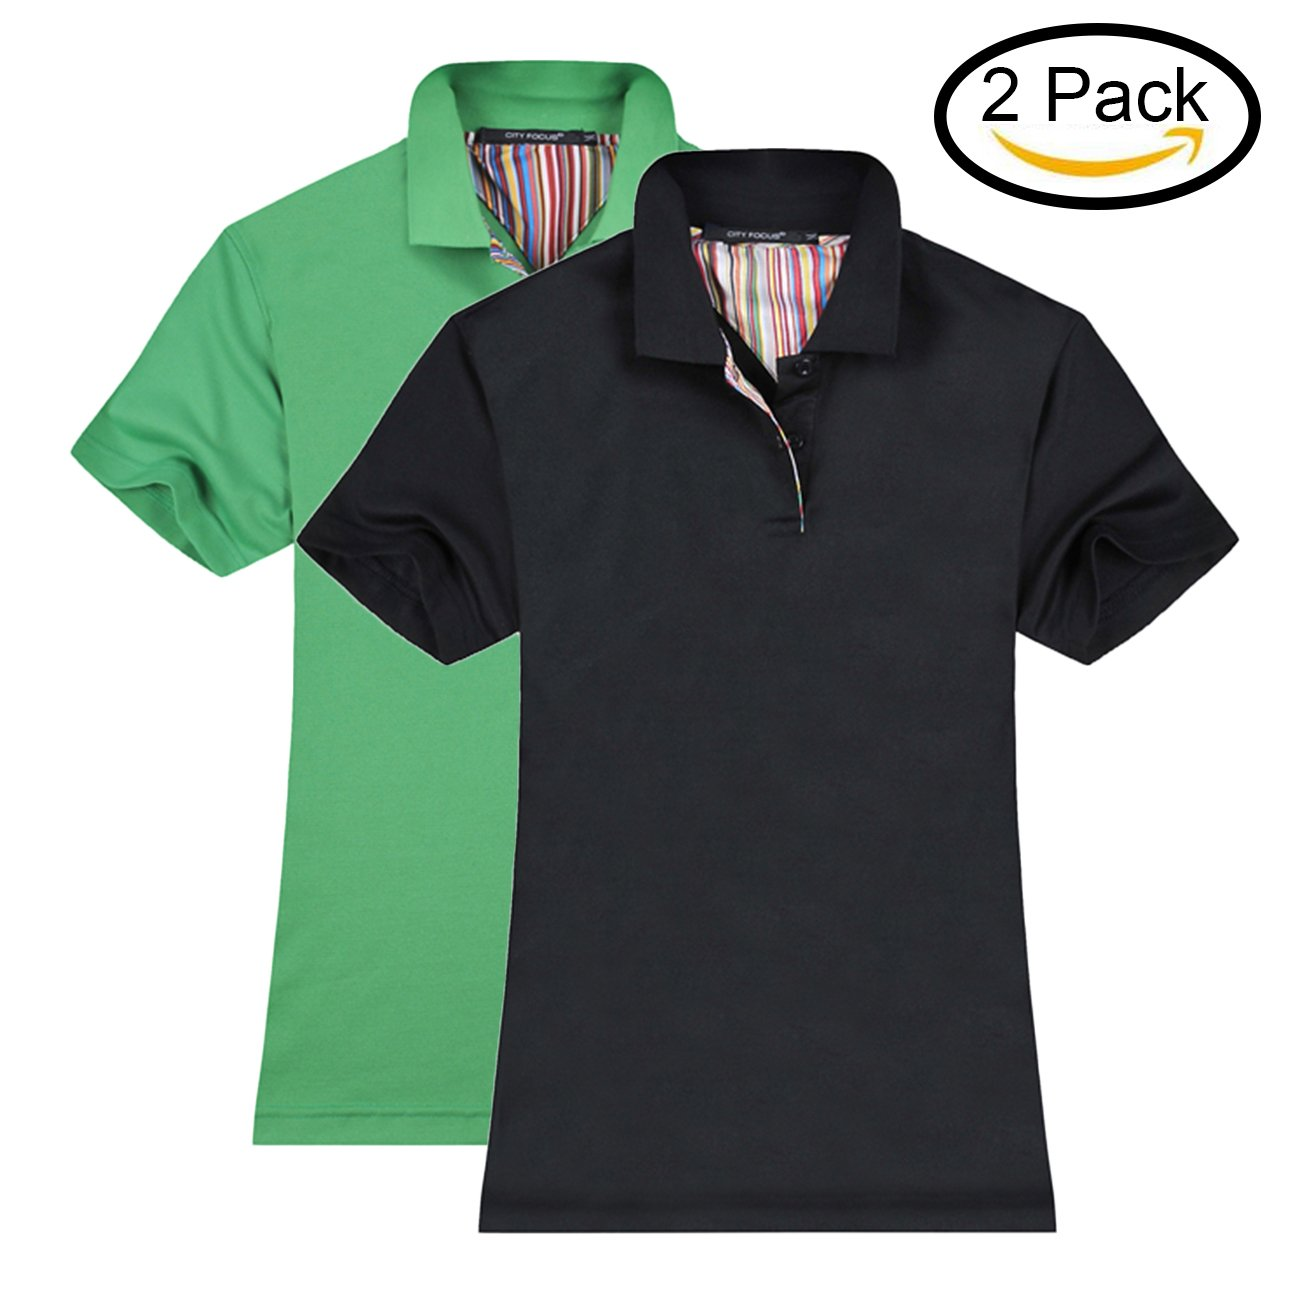 MTTROLI Womens Polo Shirts Short Sleeve Design T Shirts Womens Workwear 2 Button Design Tops